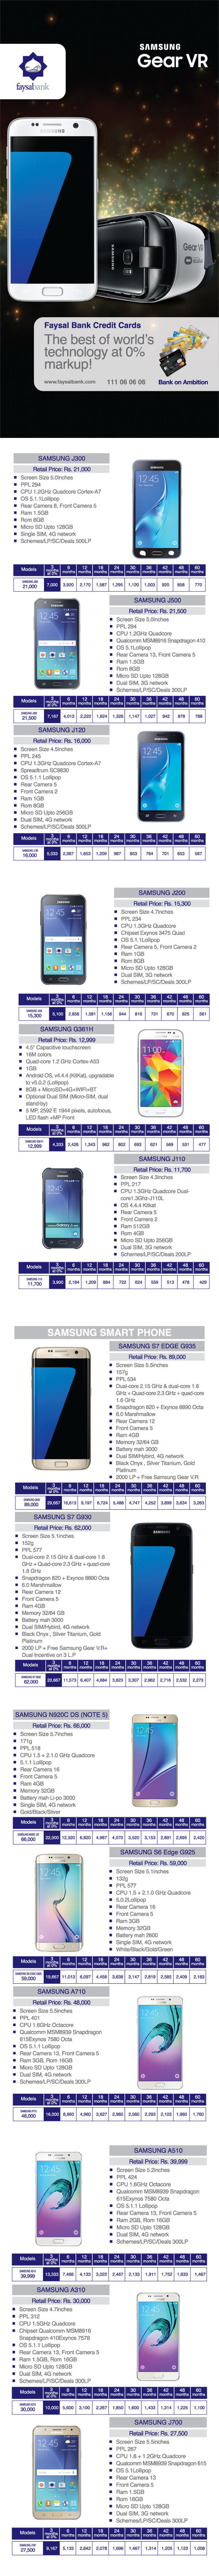 Samsung Mobiles 0% installment plan - Faysal Bank